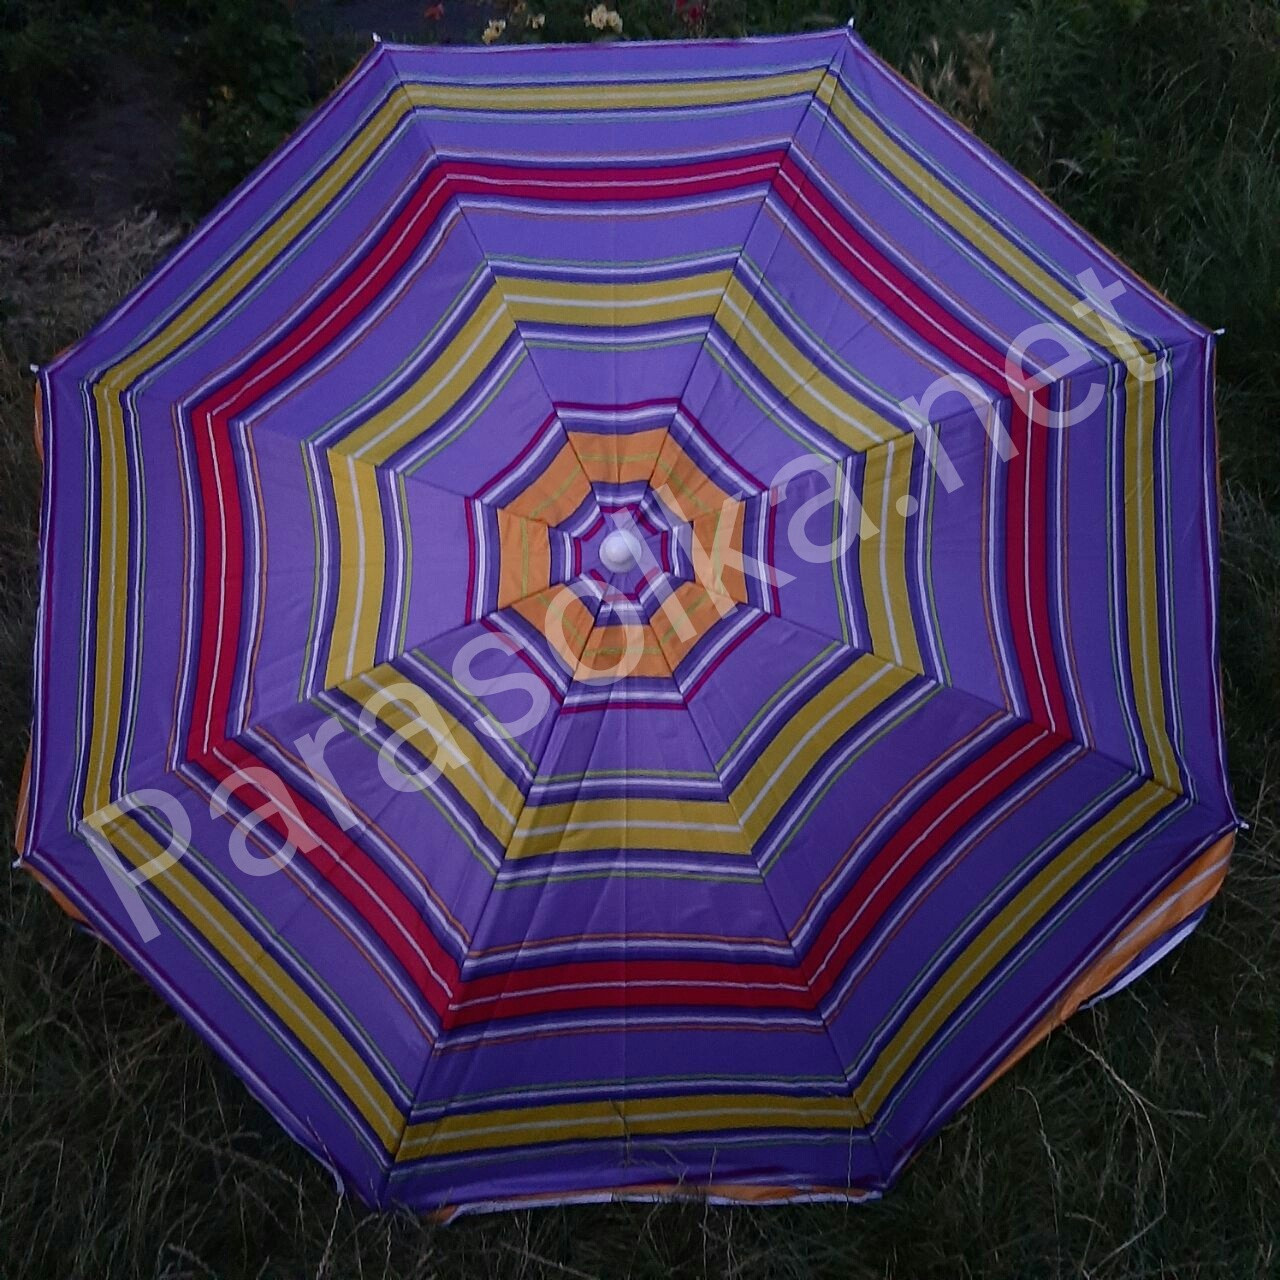 Зонт пляжний 6в 1,8 метра посилений